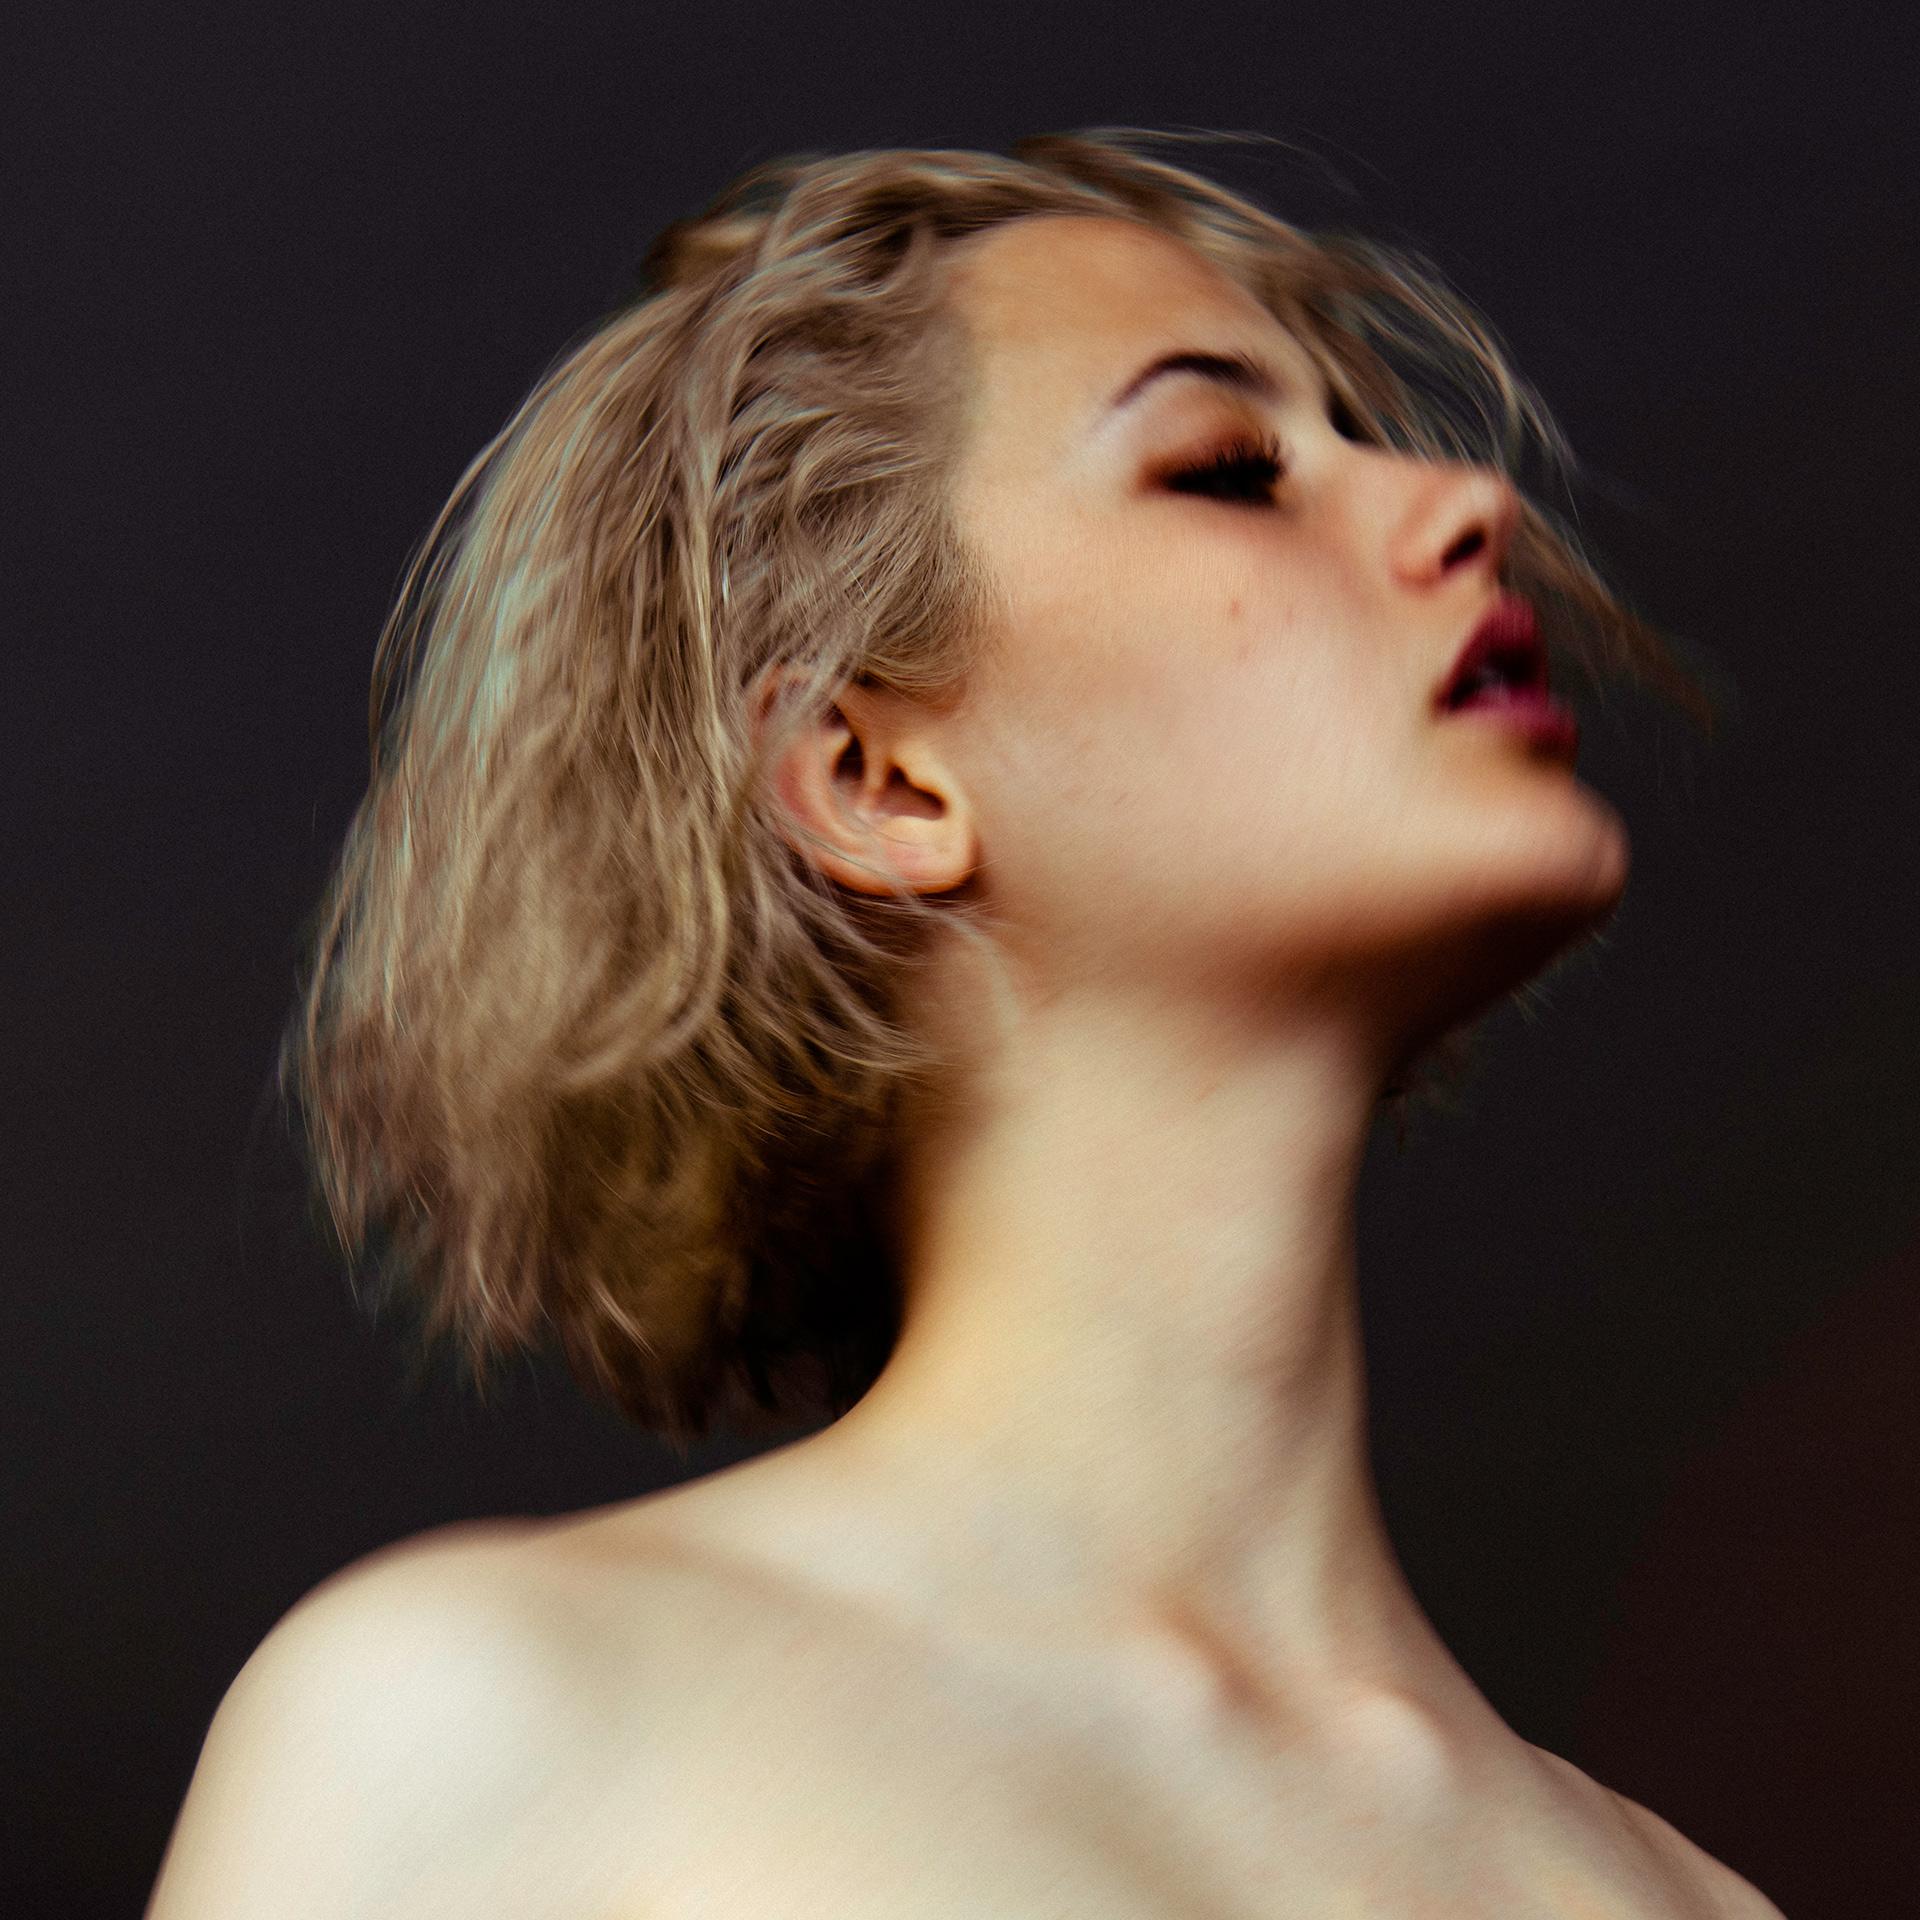 EllenGamper-by-SilvanGiger11.jpg